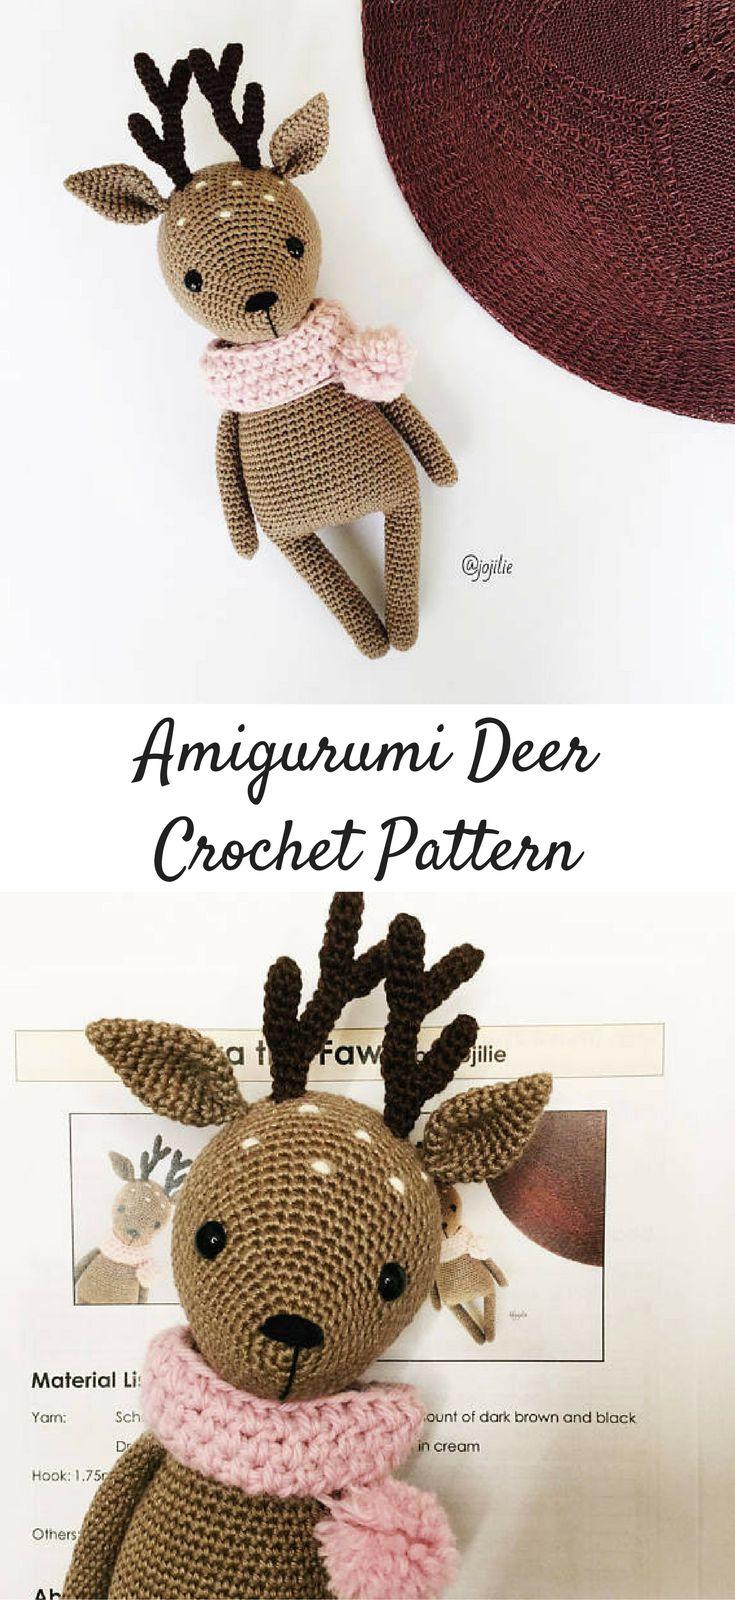 Amigurumi deer crochet pattern #ad #amigurumis #amigurumidoll #amigurumilove #amigurumitoy #amigurumipattern #crochet #crochetaddict #crochetlove #crochetpattern